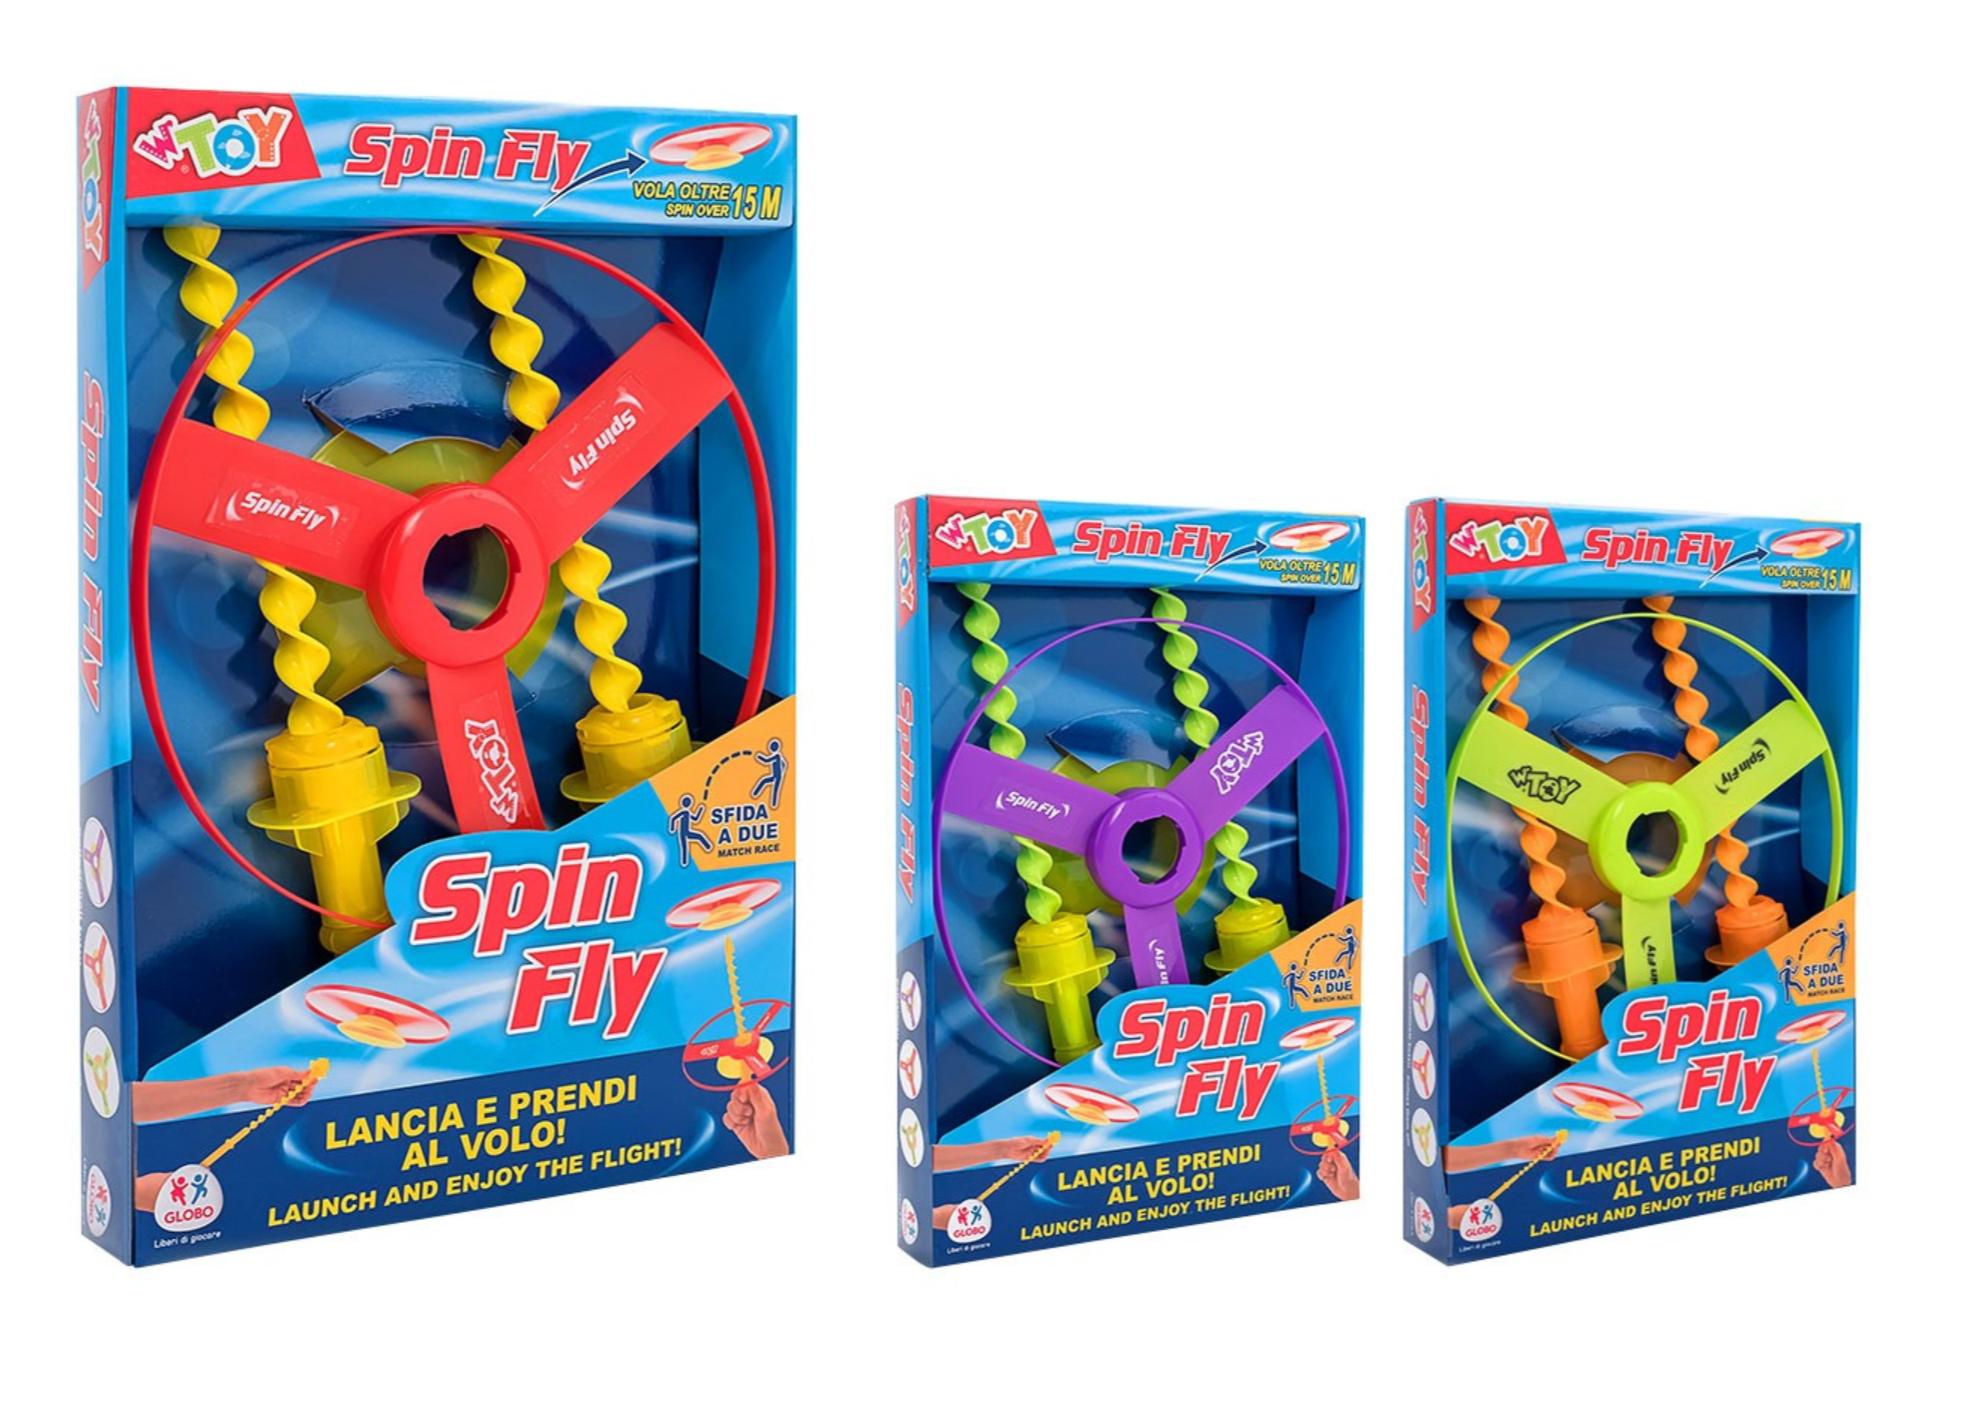 Spin Fly gioco prezzo